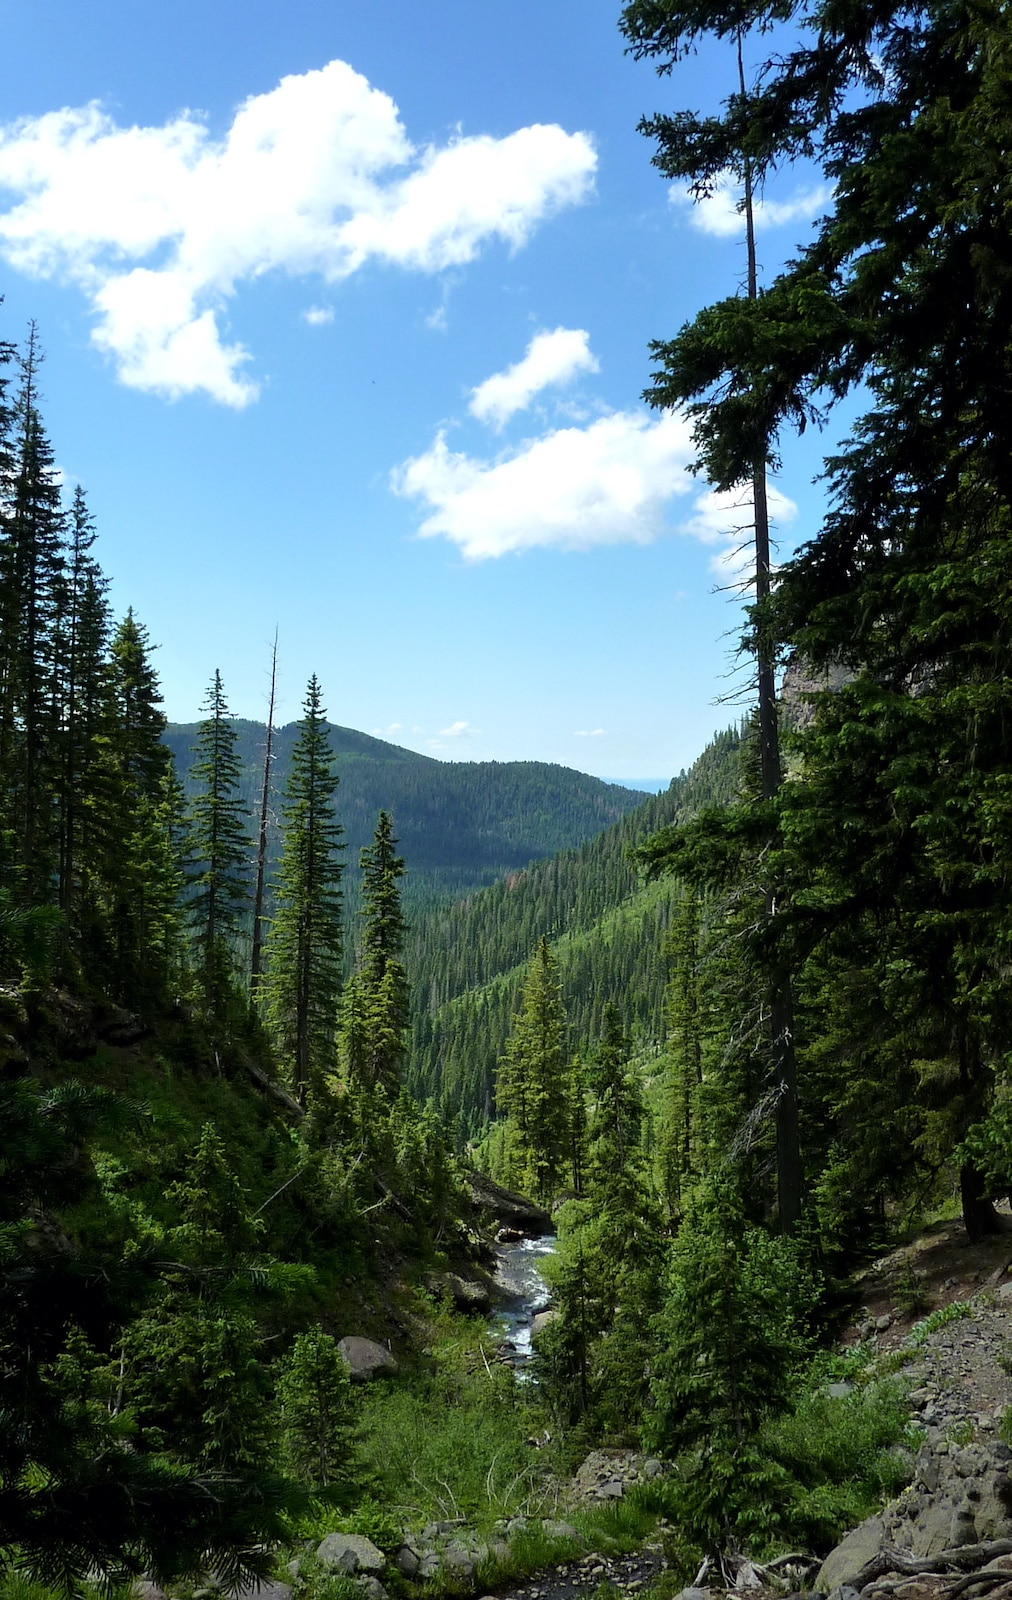 Pemandangan dari Fourmile Trail Di Atas Air Terjun Atas Colorado